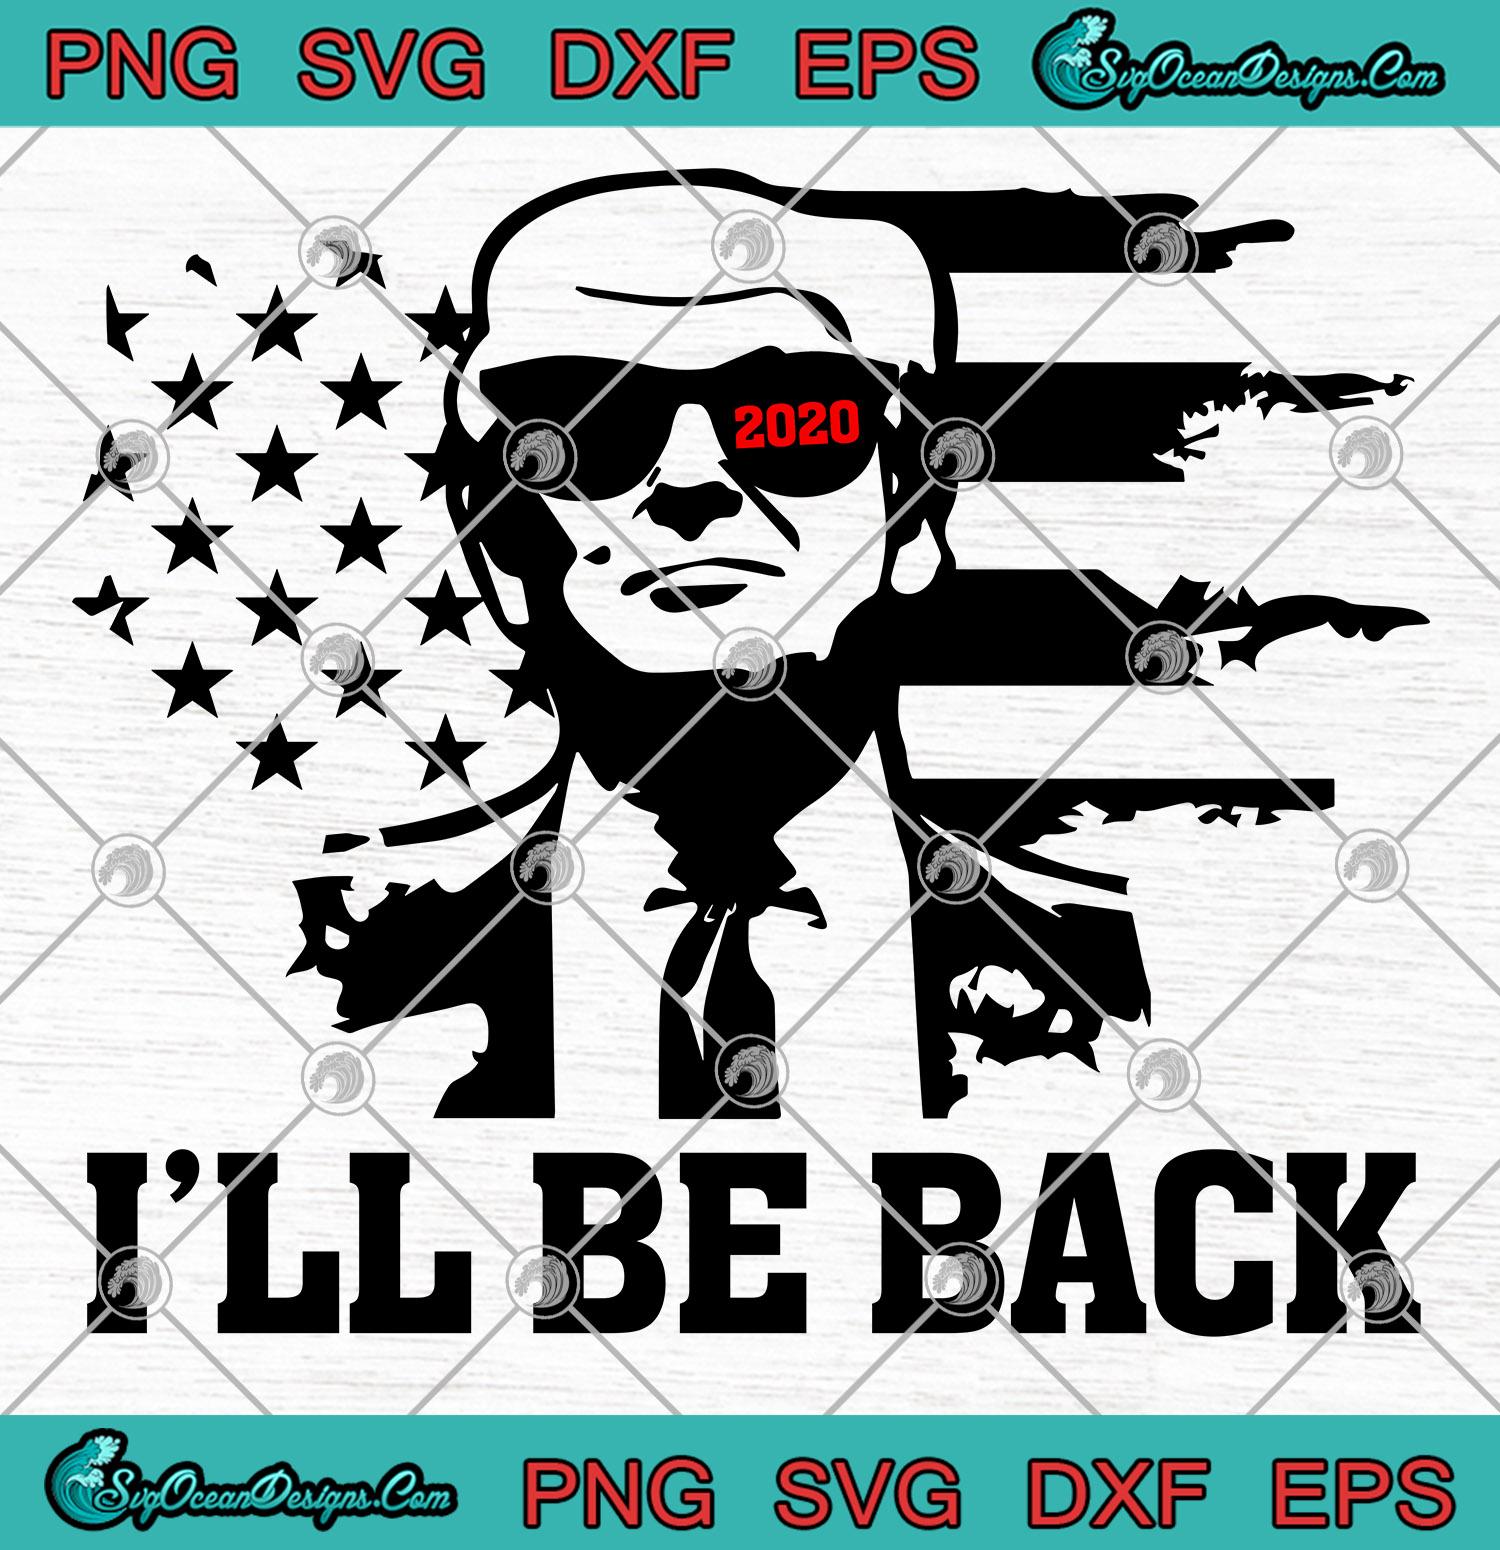 I Ll Be Back Trump 2020 Svg Png Eps Dxf Trump 2020 Svg Png Cricut File Silhouette Svg Designs Digital Download